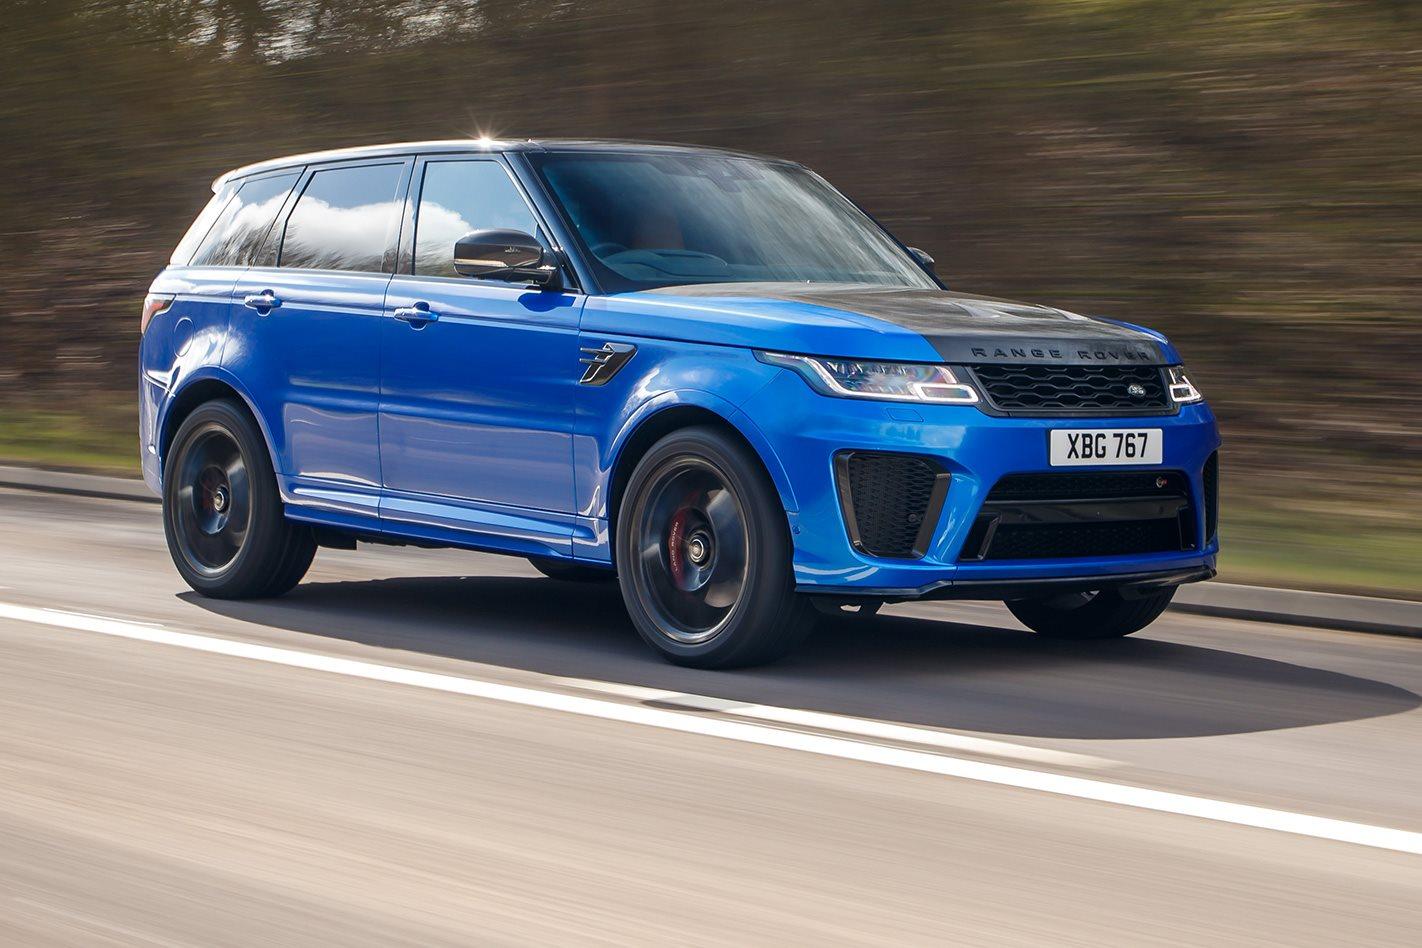 2015 Land Rover Range Rover Evoque Pure >> 2018 Range Rover Sport SVR review